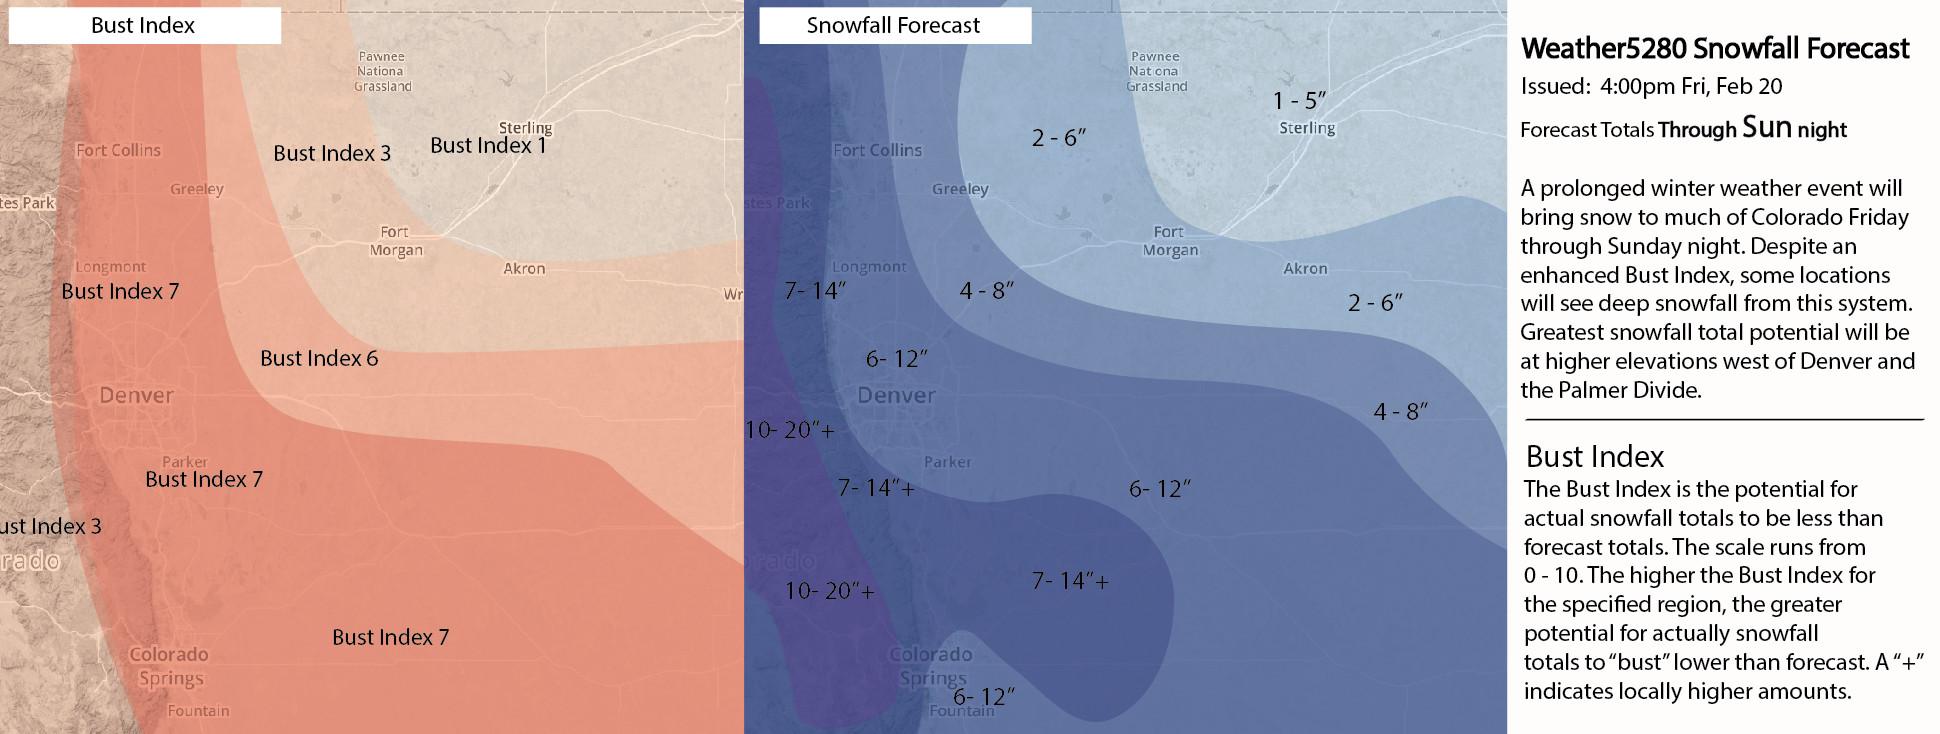 Weather5280 Forecast